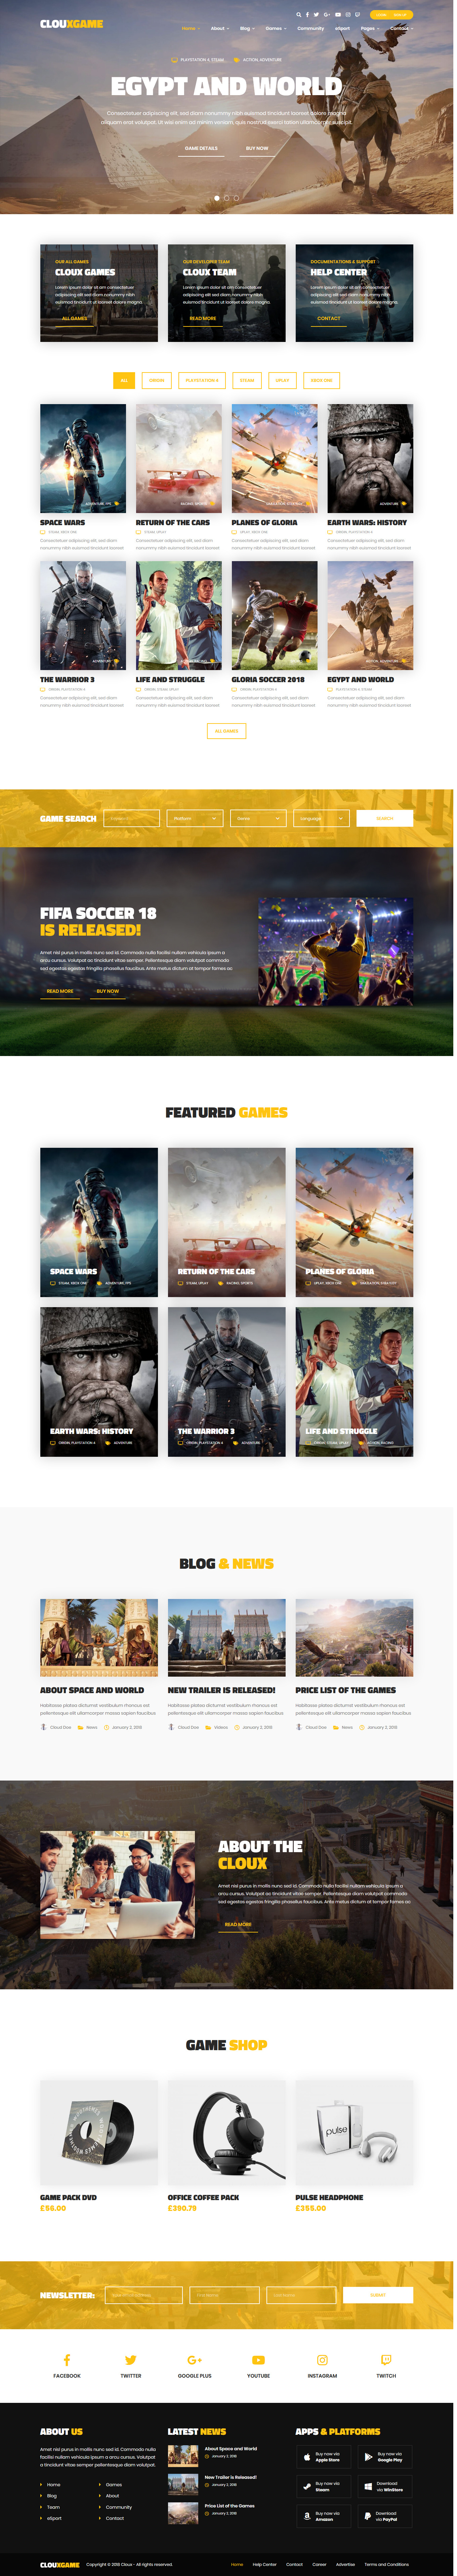 cloux best premium gaming wordpress theme - 10+ Best Premium Gaming WordPress Themes